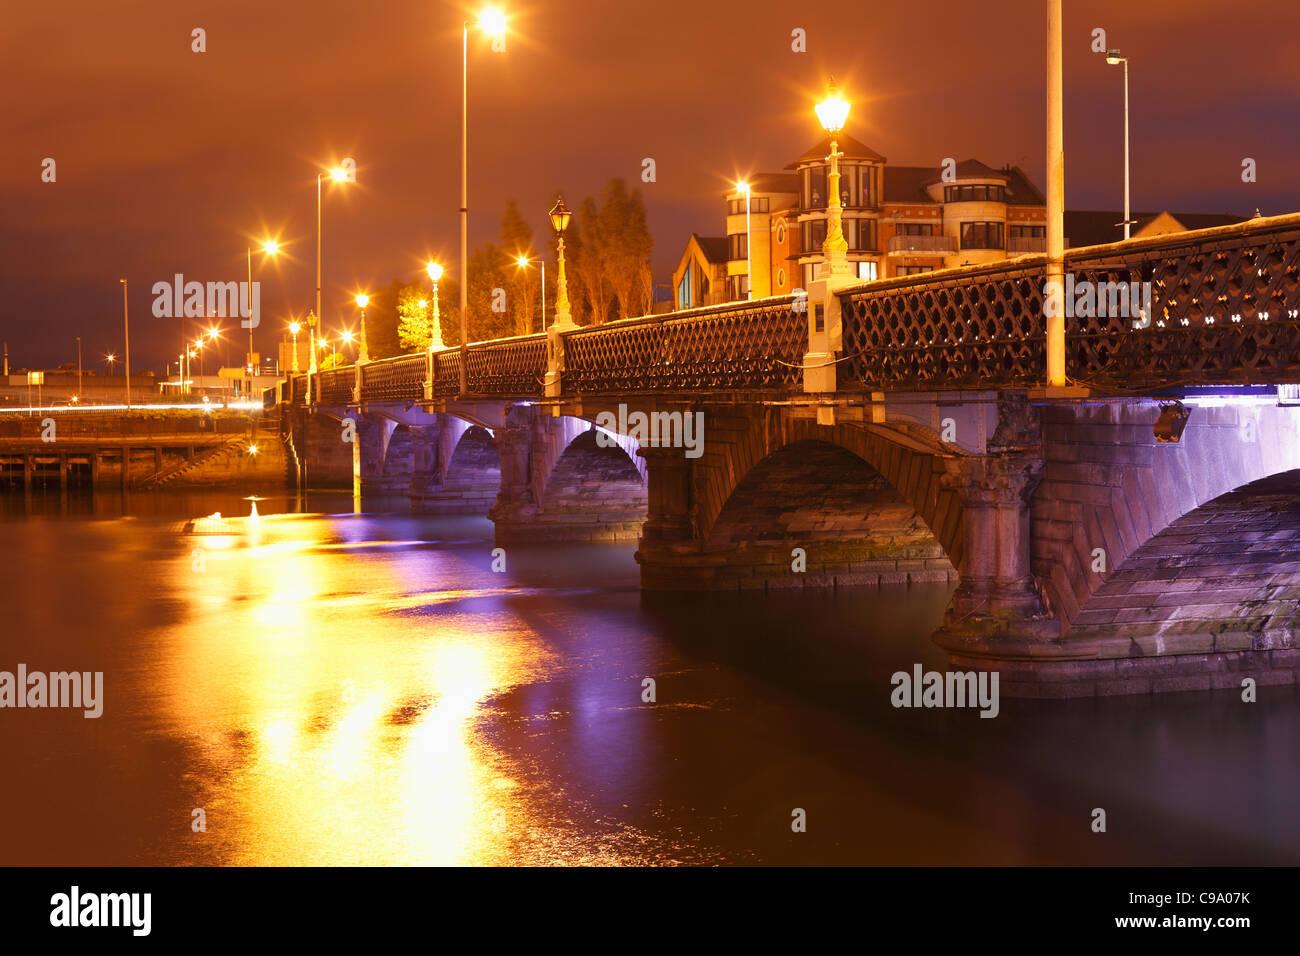 United Kingdom, Ireland, Northern Ireland, West Belfast, Queen's bridge with Lagan river at night - Stock Image